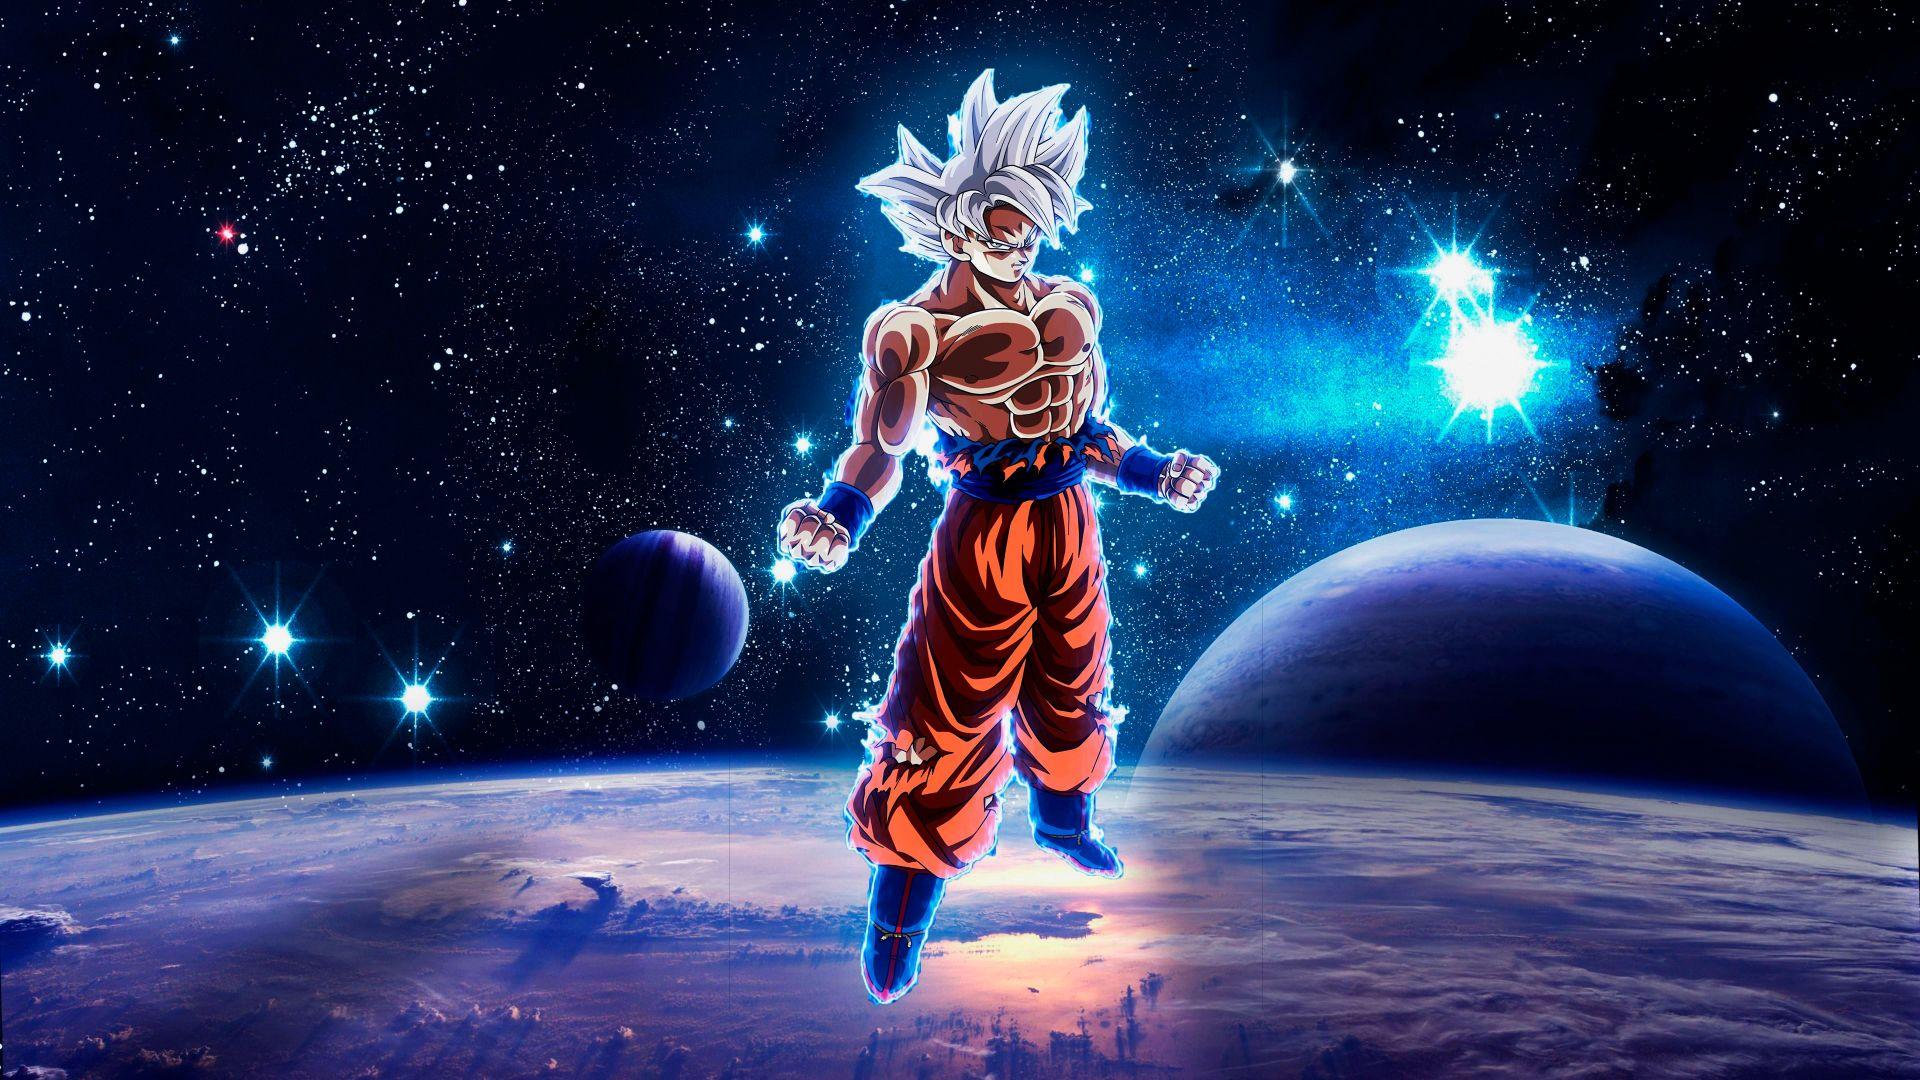 Son Goku Dragon Ball Super Artwork Anime Dragon Ball Super Dragon Ball Super Manga